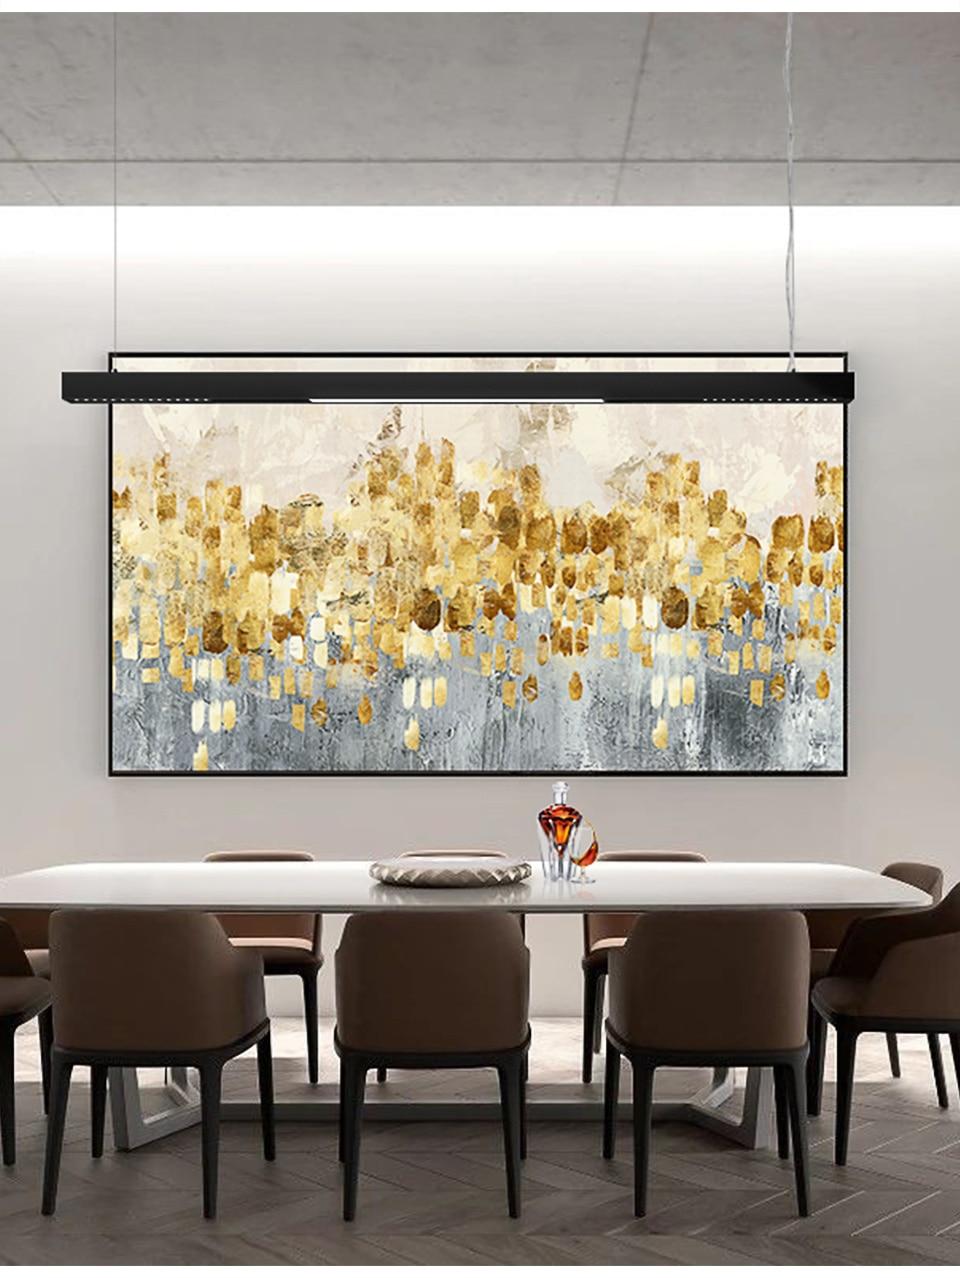 Suspended Ceiling Lighting Magnet Rails Surface Mounts On The Wall For Room Kitchen Spot Fog Luminaires LED Track Running Lamp